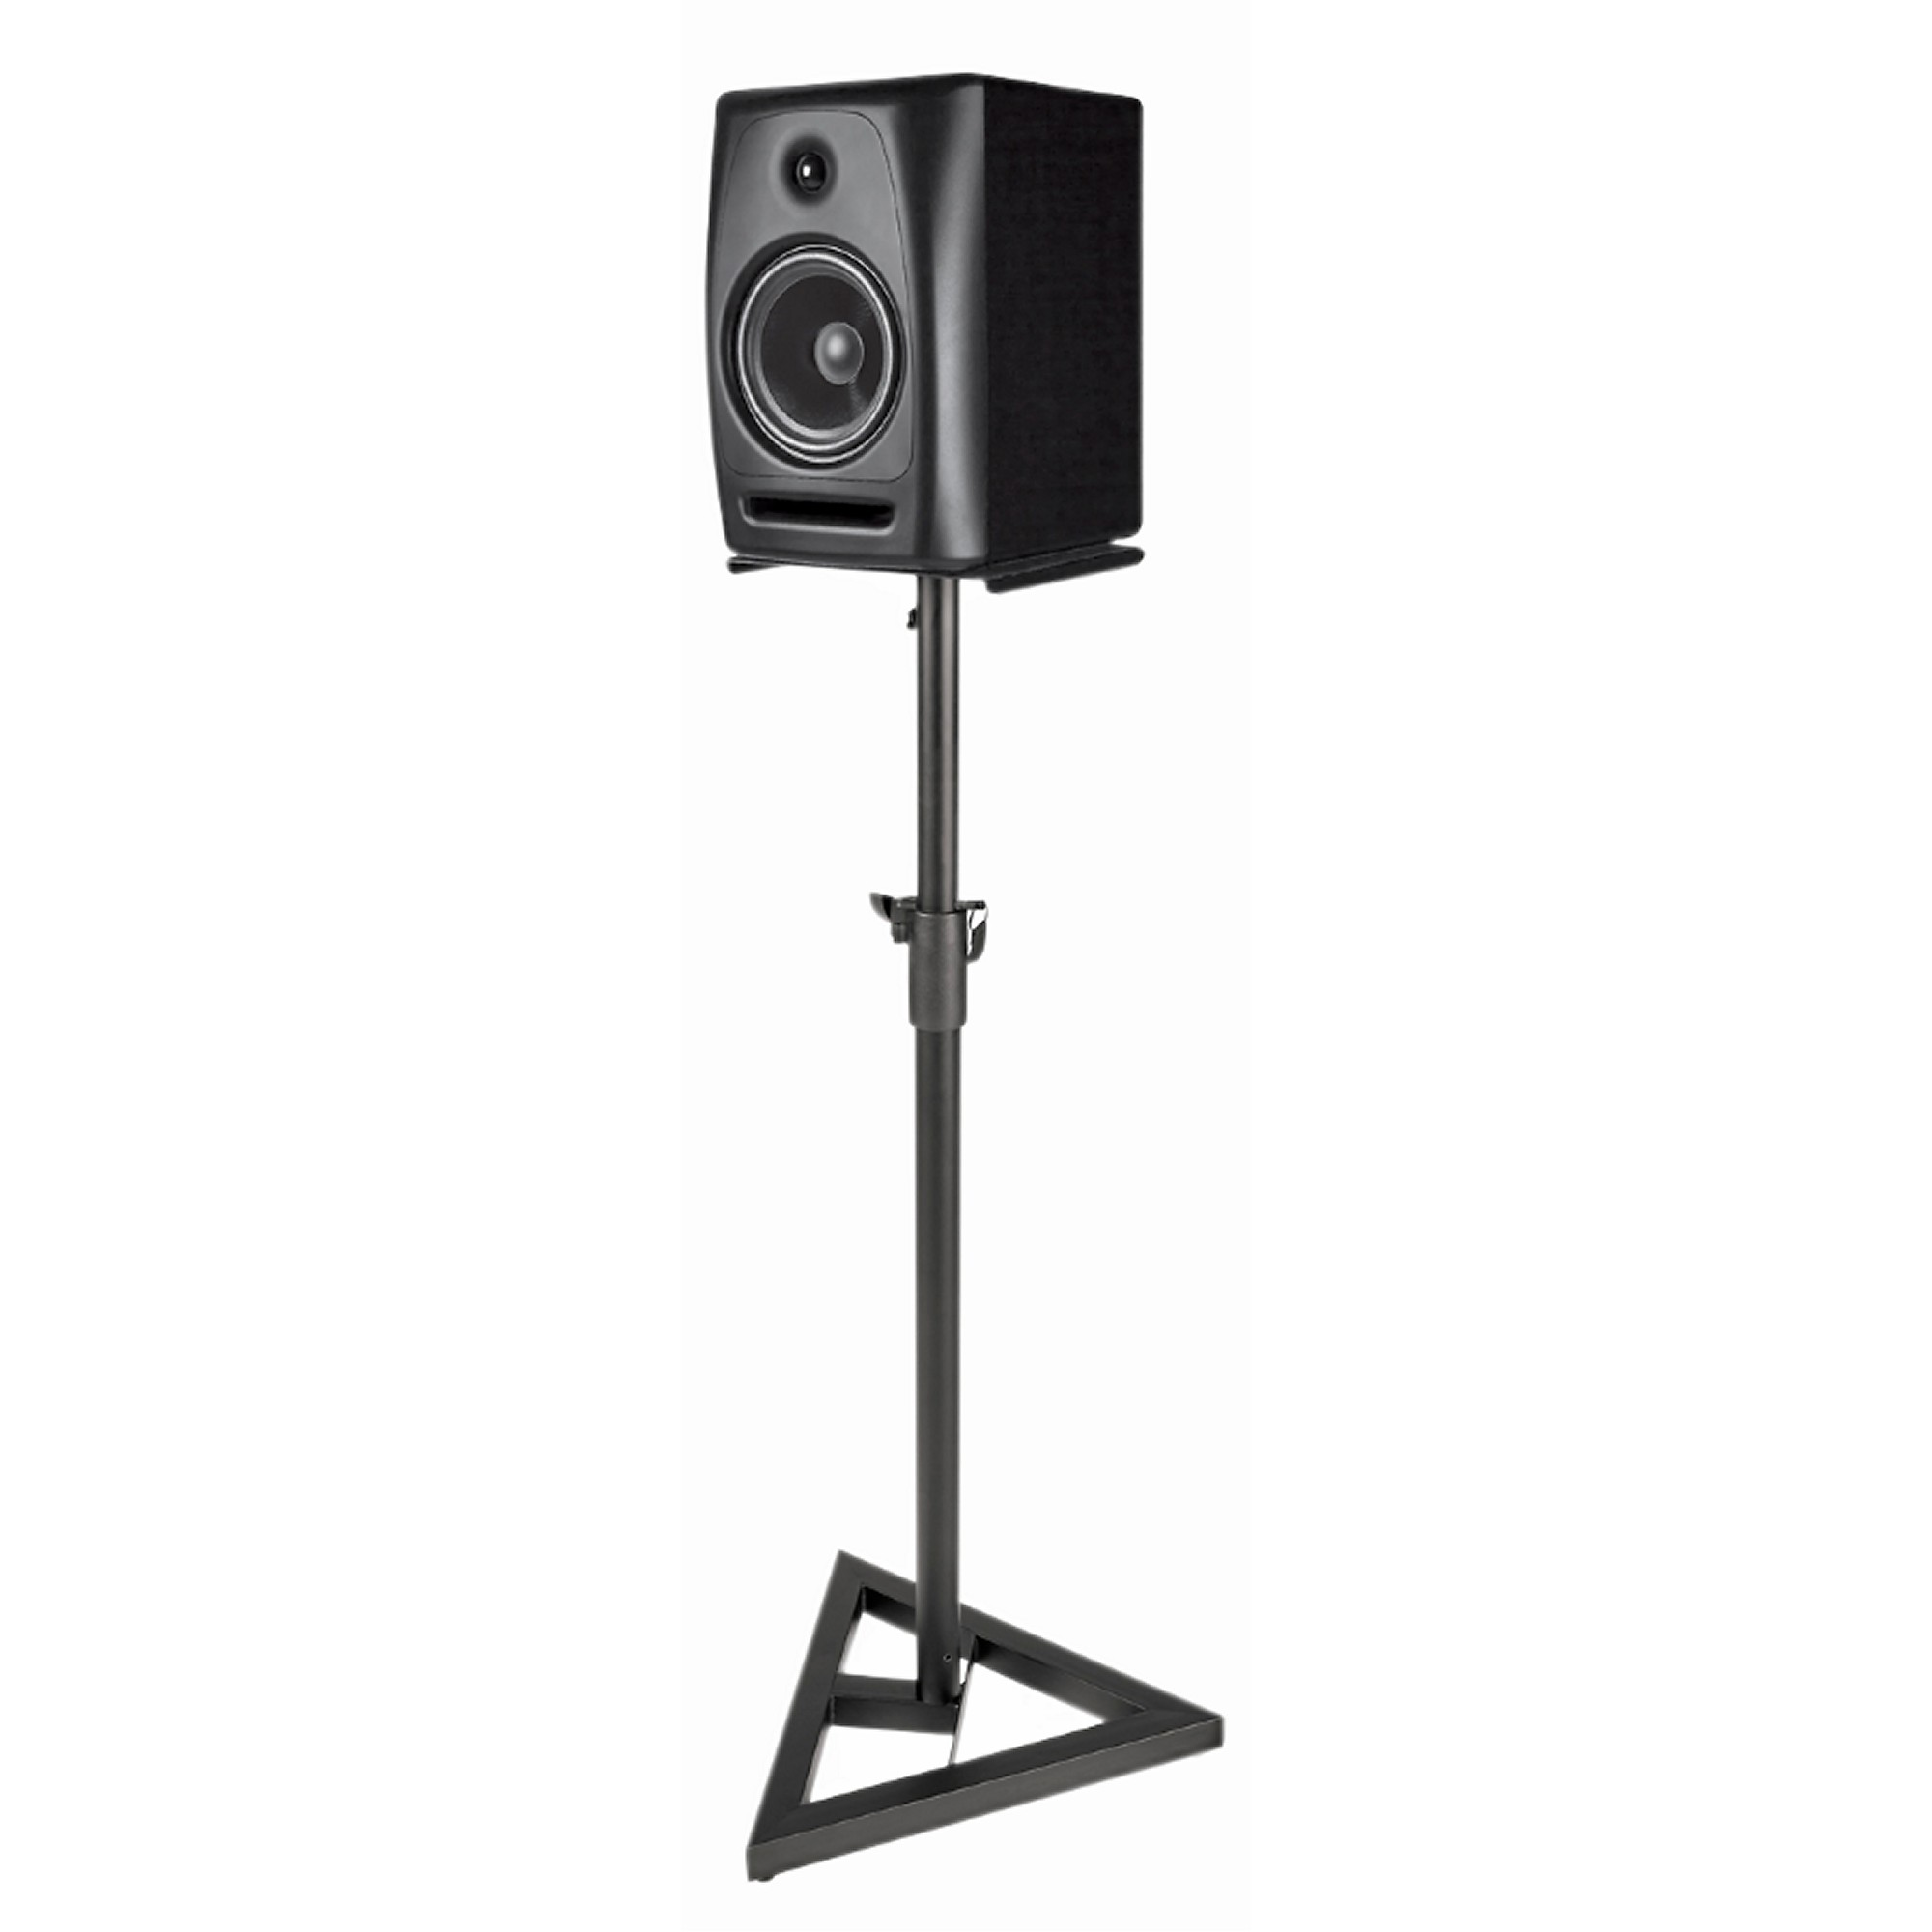 Adjustable Studio Monitor Stands - PL600P